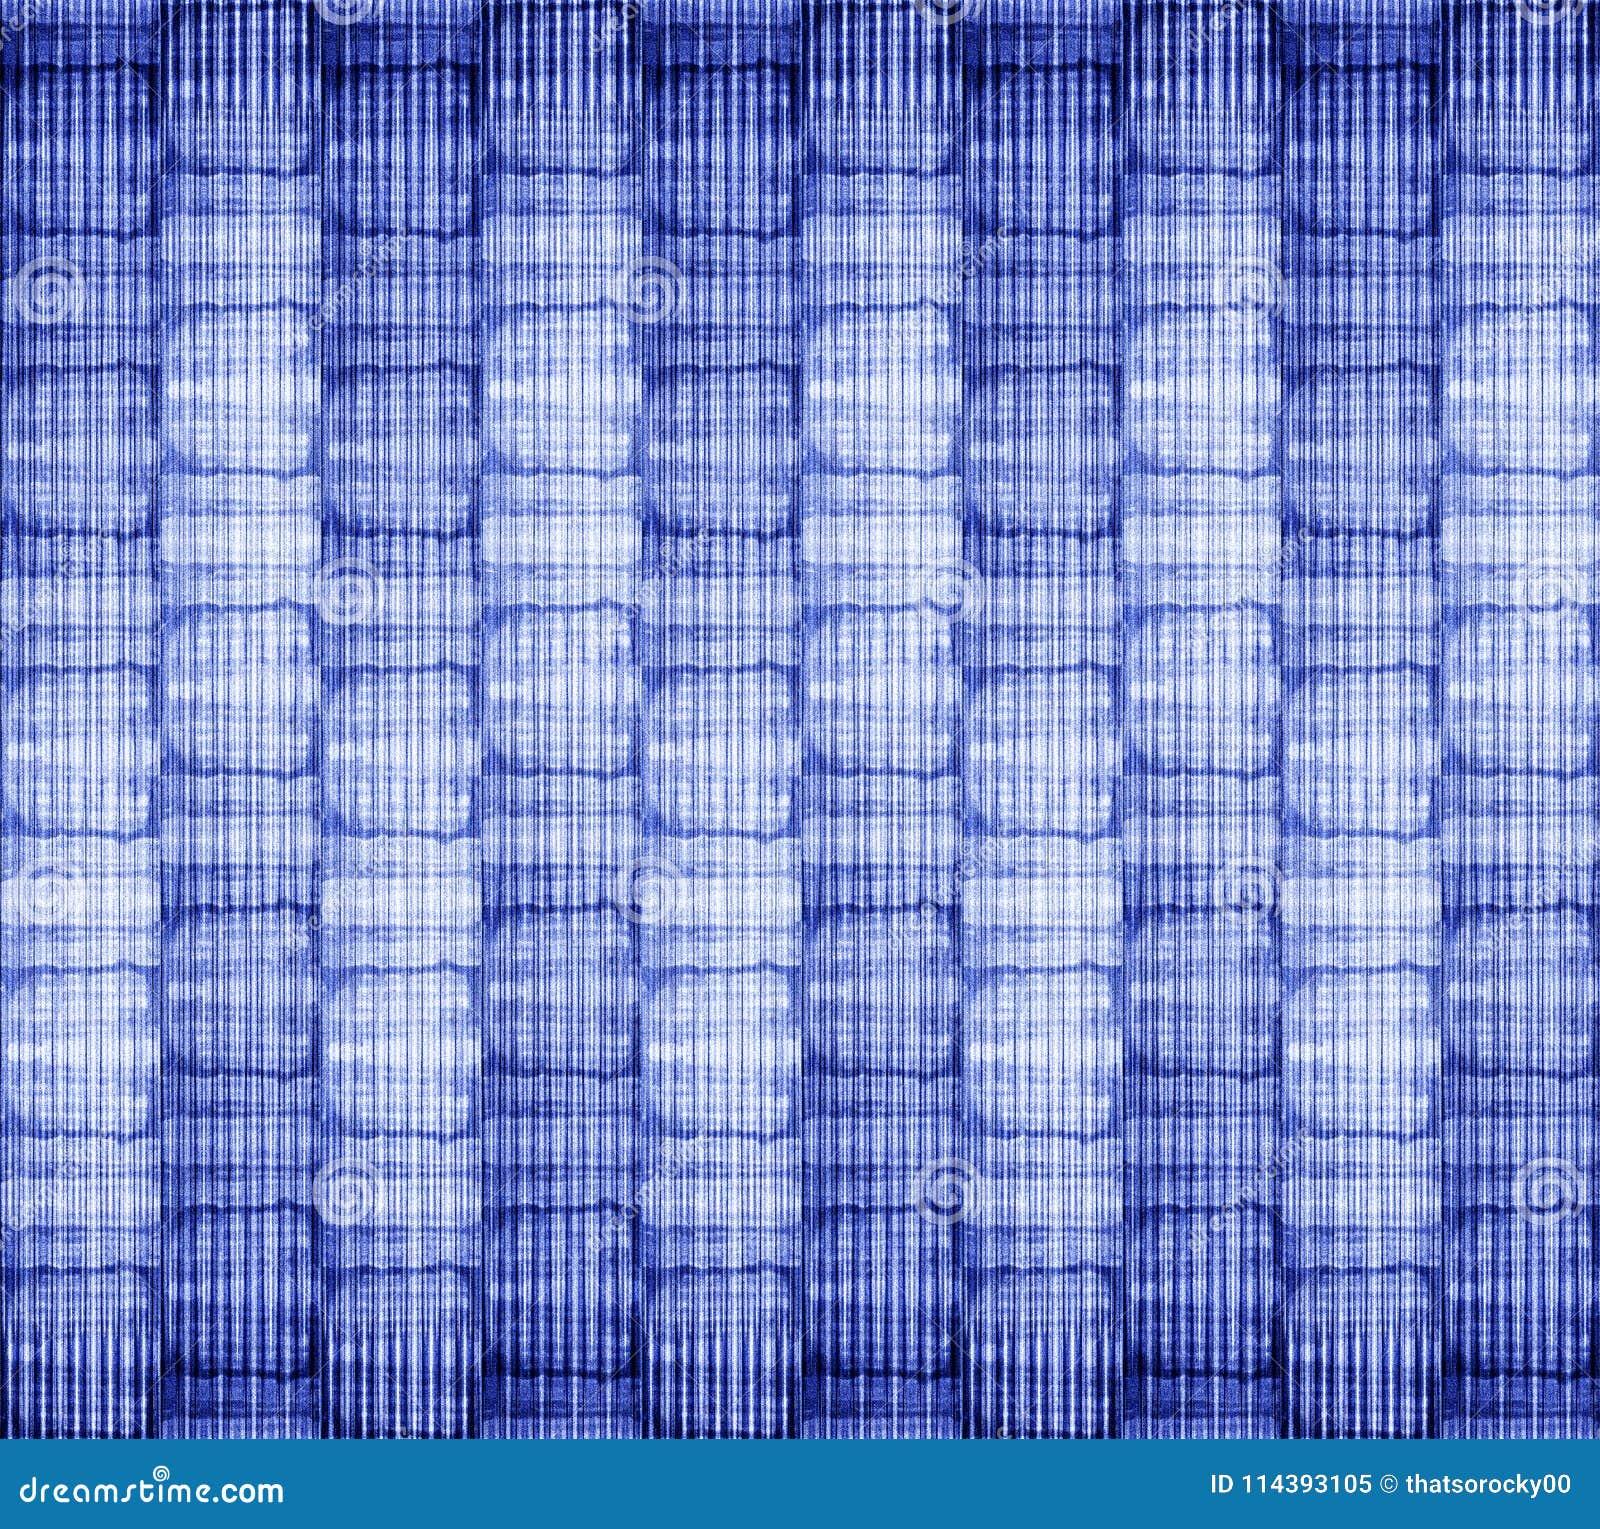 Tie dye batik texture repeat modern pattern